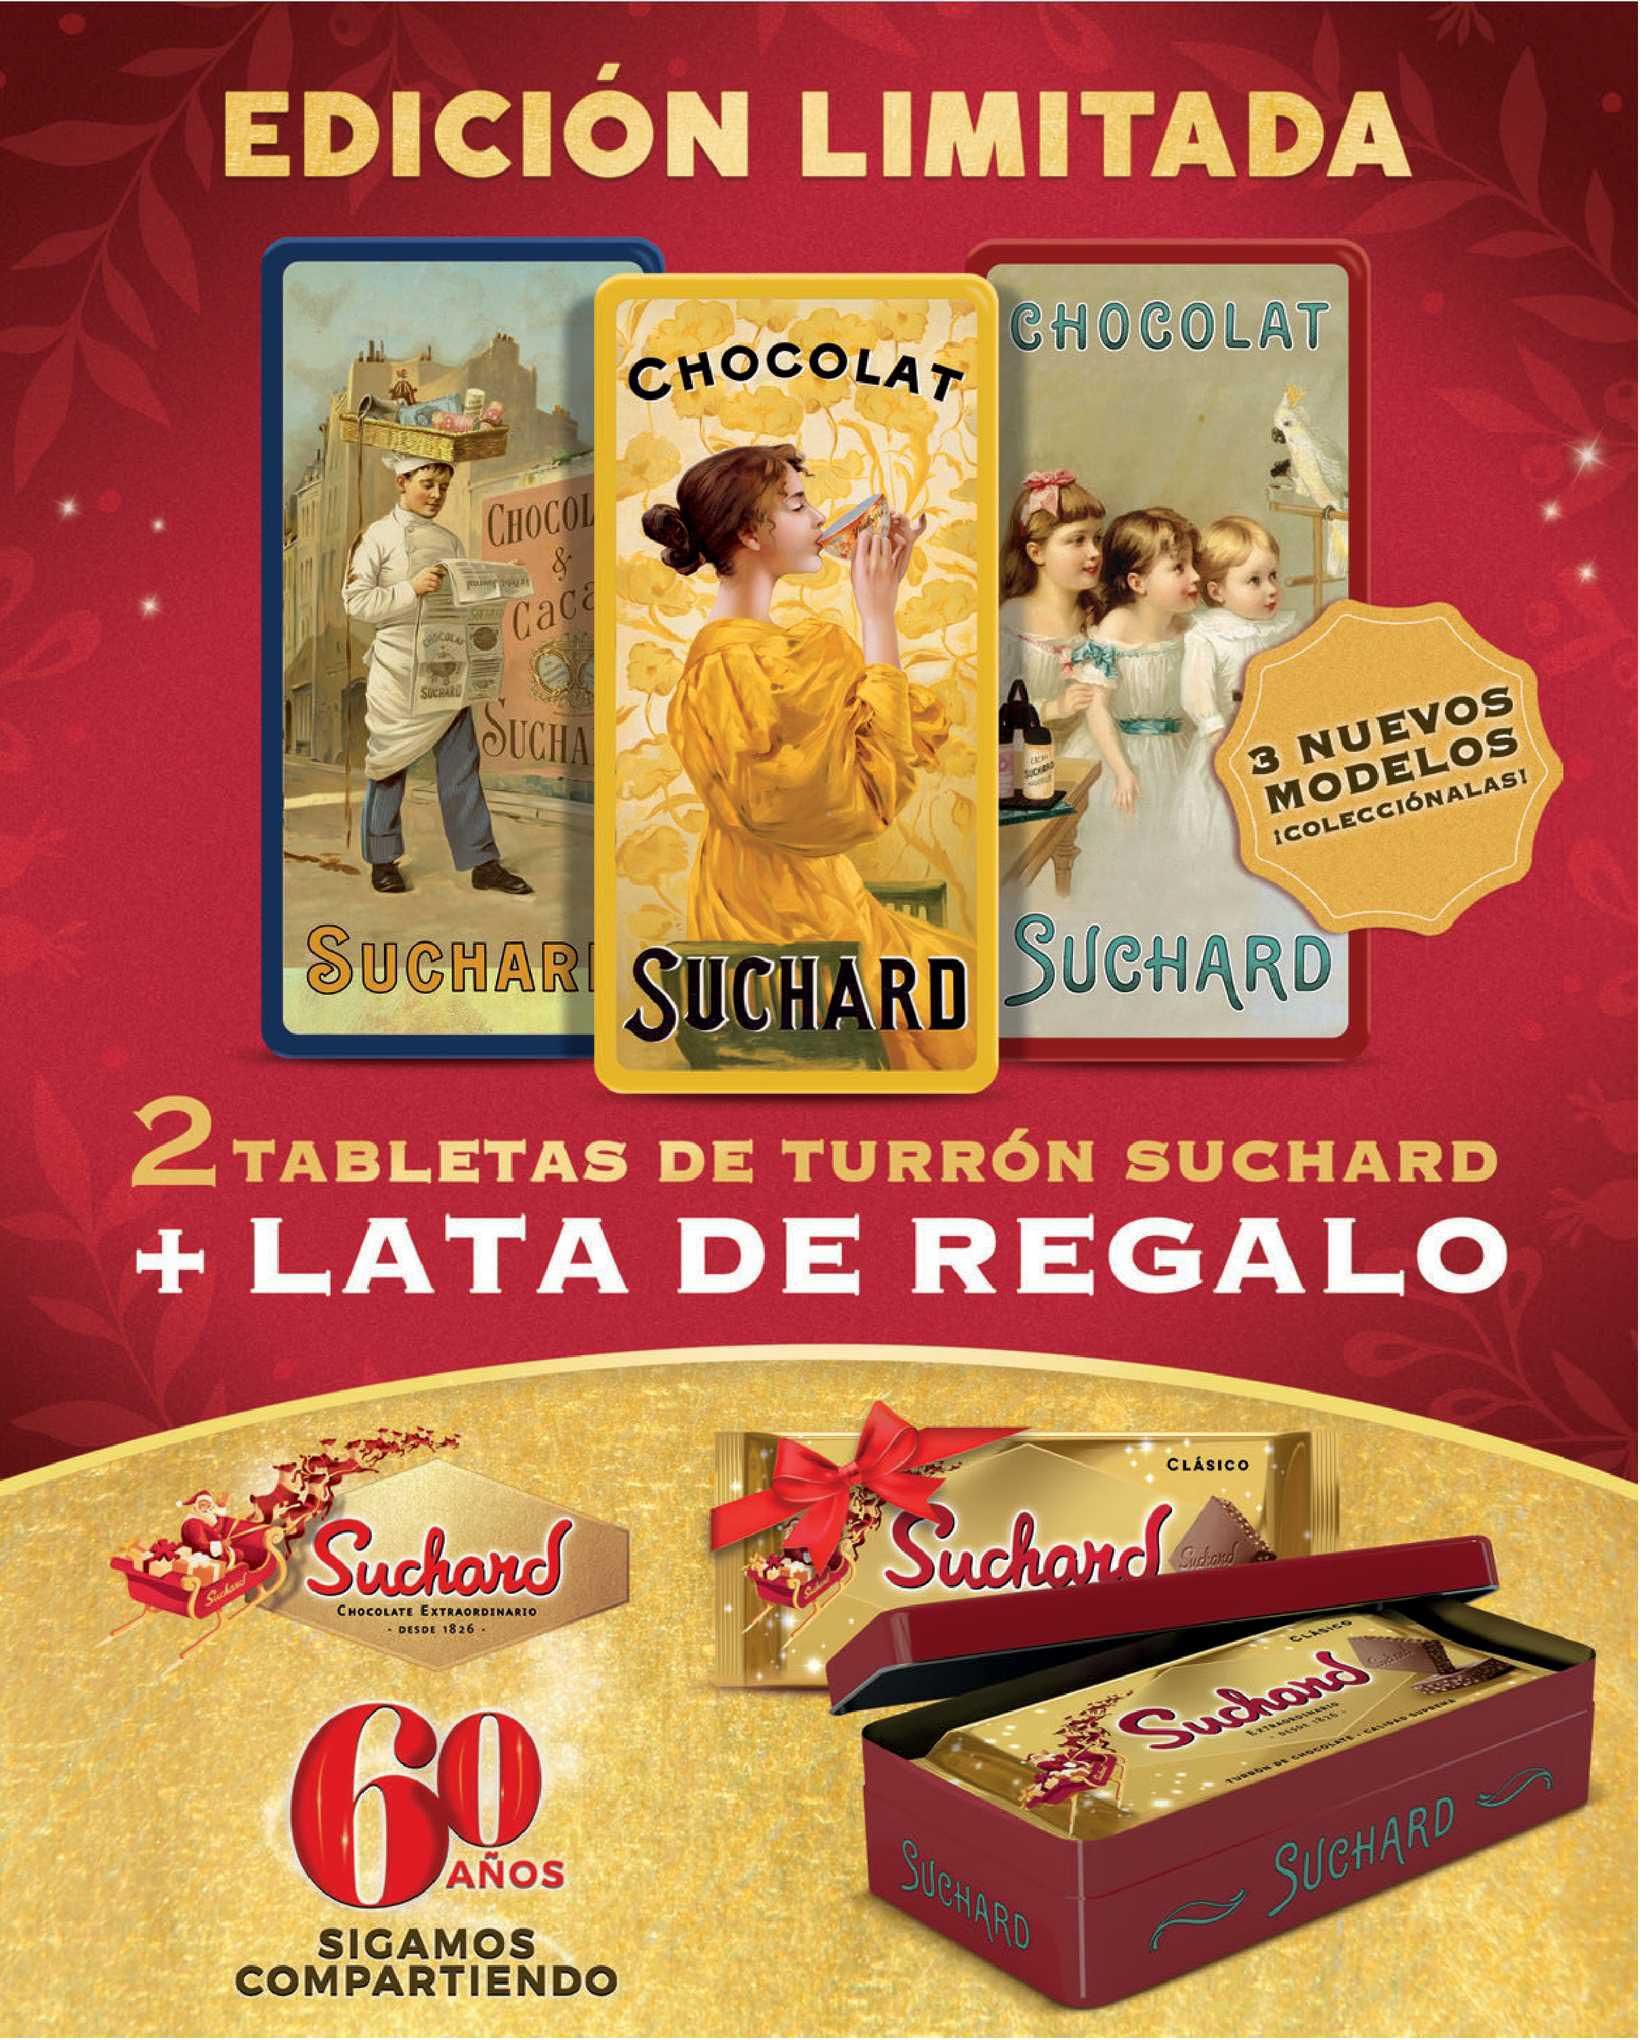 Carrefour Edición Limitada 2 Tabletas De Turrón Suchard + Lata De Regalo